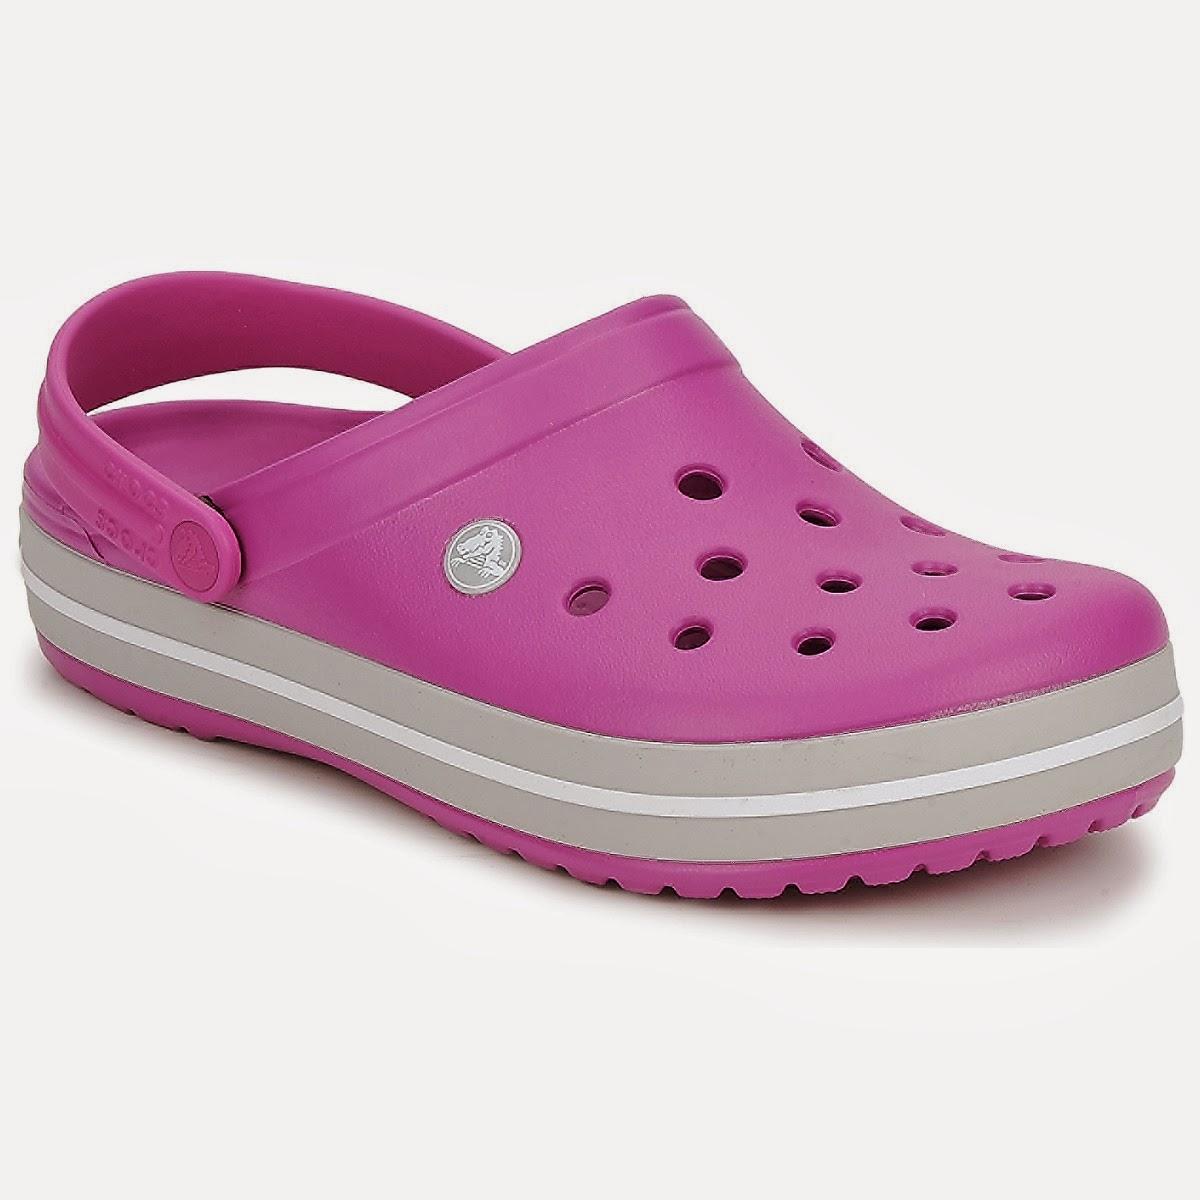 Zapatos grises formales Crocs para mujer MOkbsz